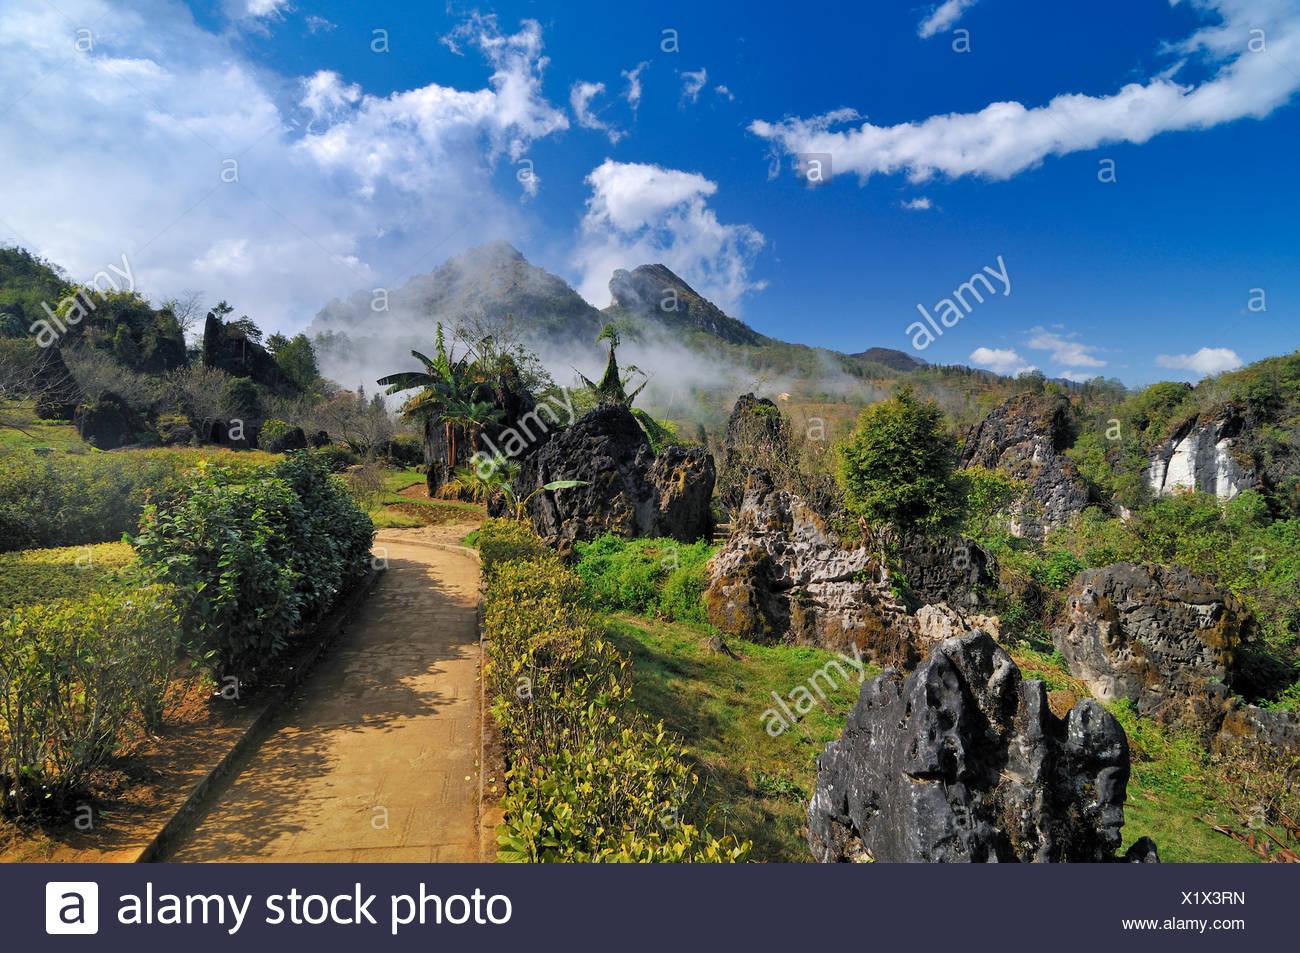 Ham Rong Mountain, Dragon Jaw Mountain, Sapa, Vietnam, Asia - Stock Image